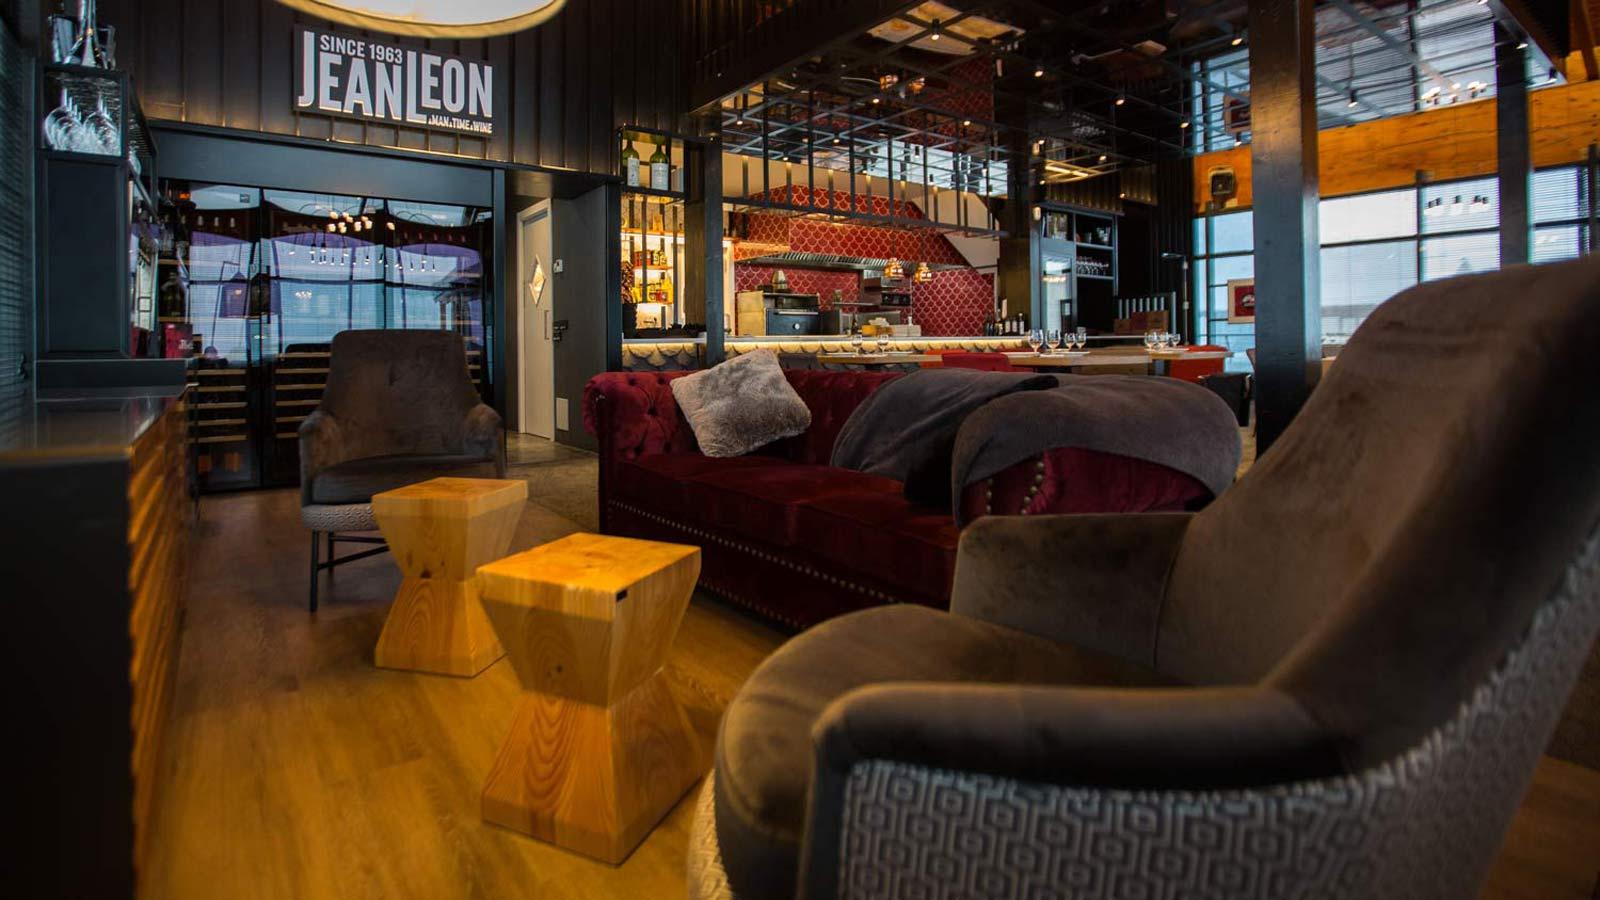 Sofás Chill Lounge Restaurant Jean Leon Meat and Wine Bar Grandvalira, Andorra - Rosa Colet Design